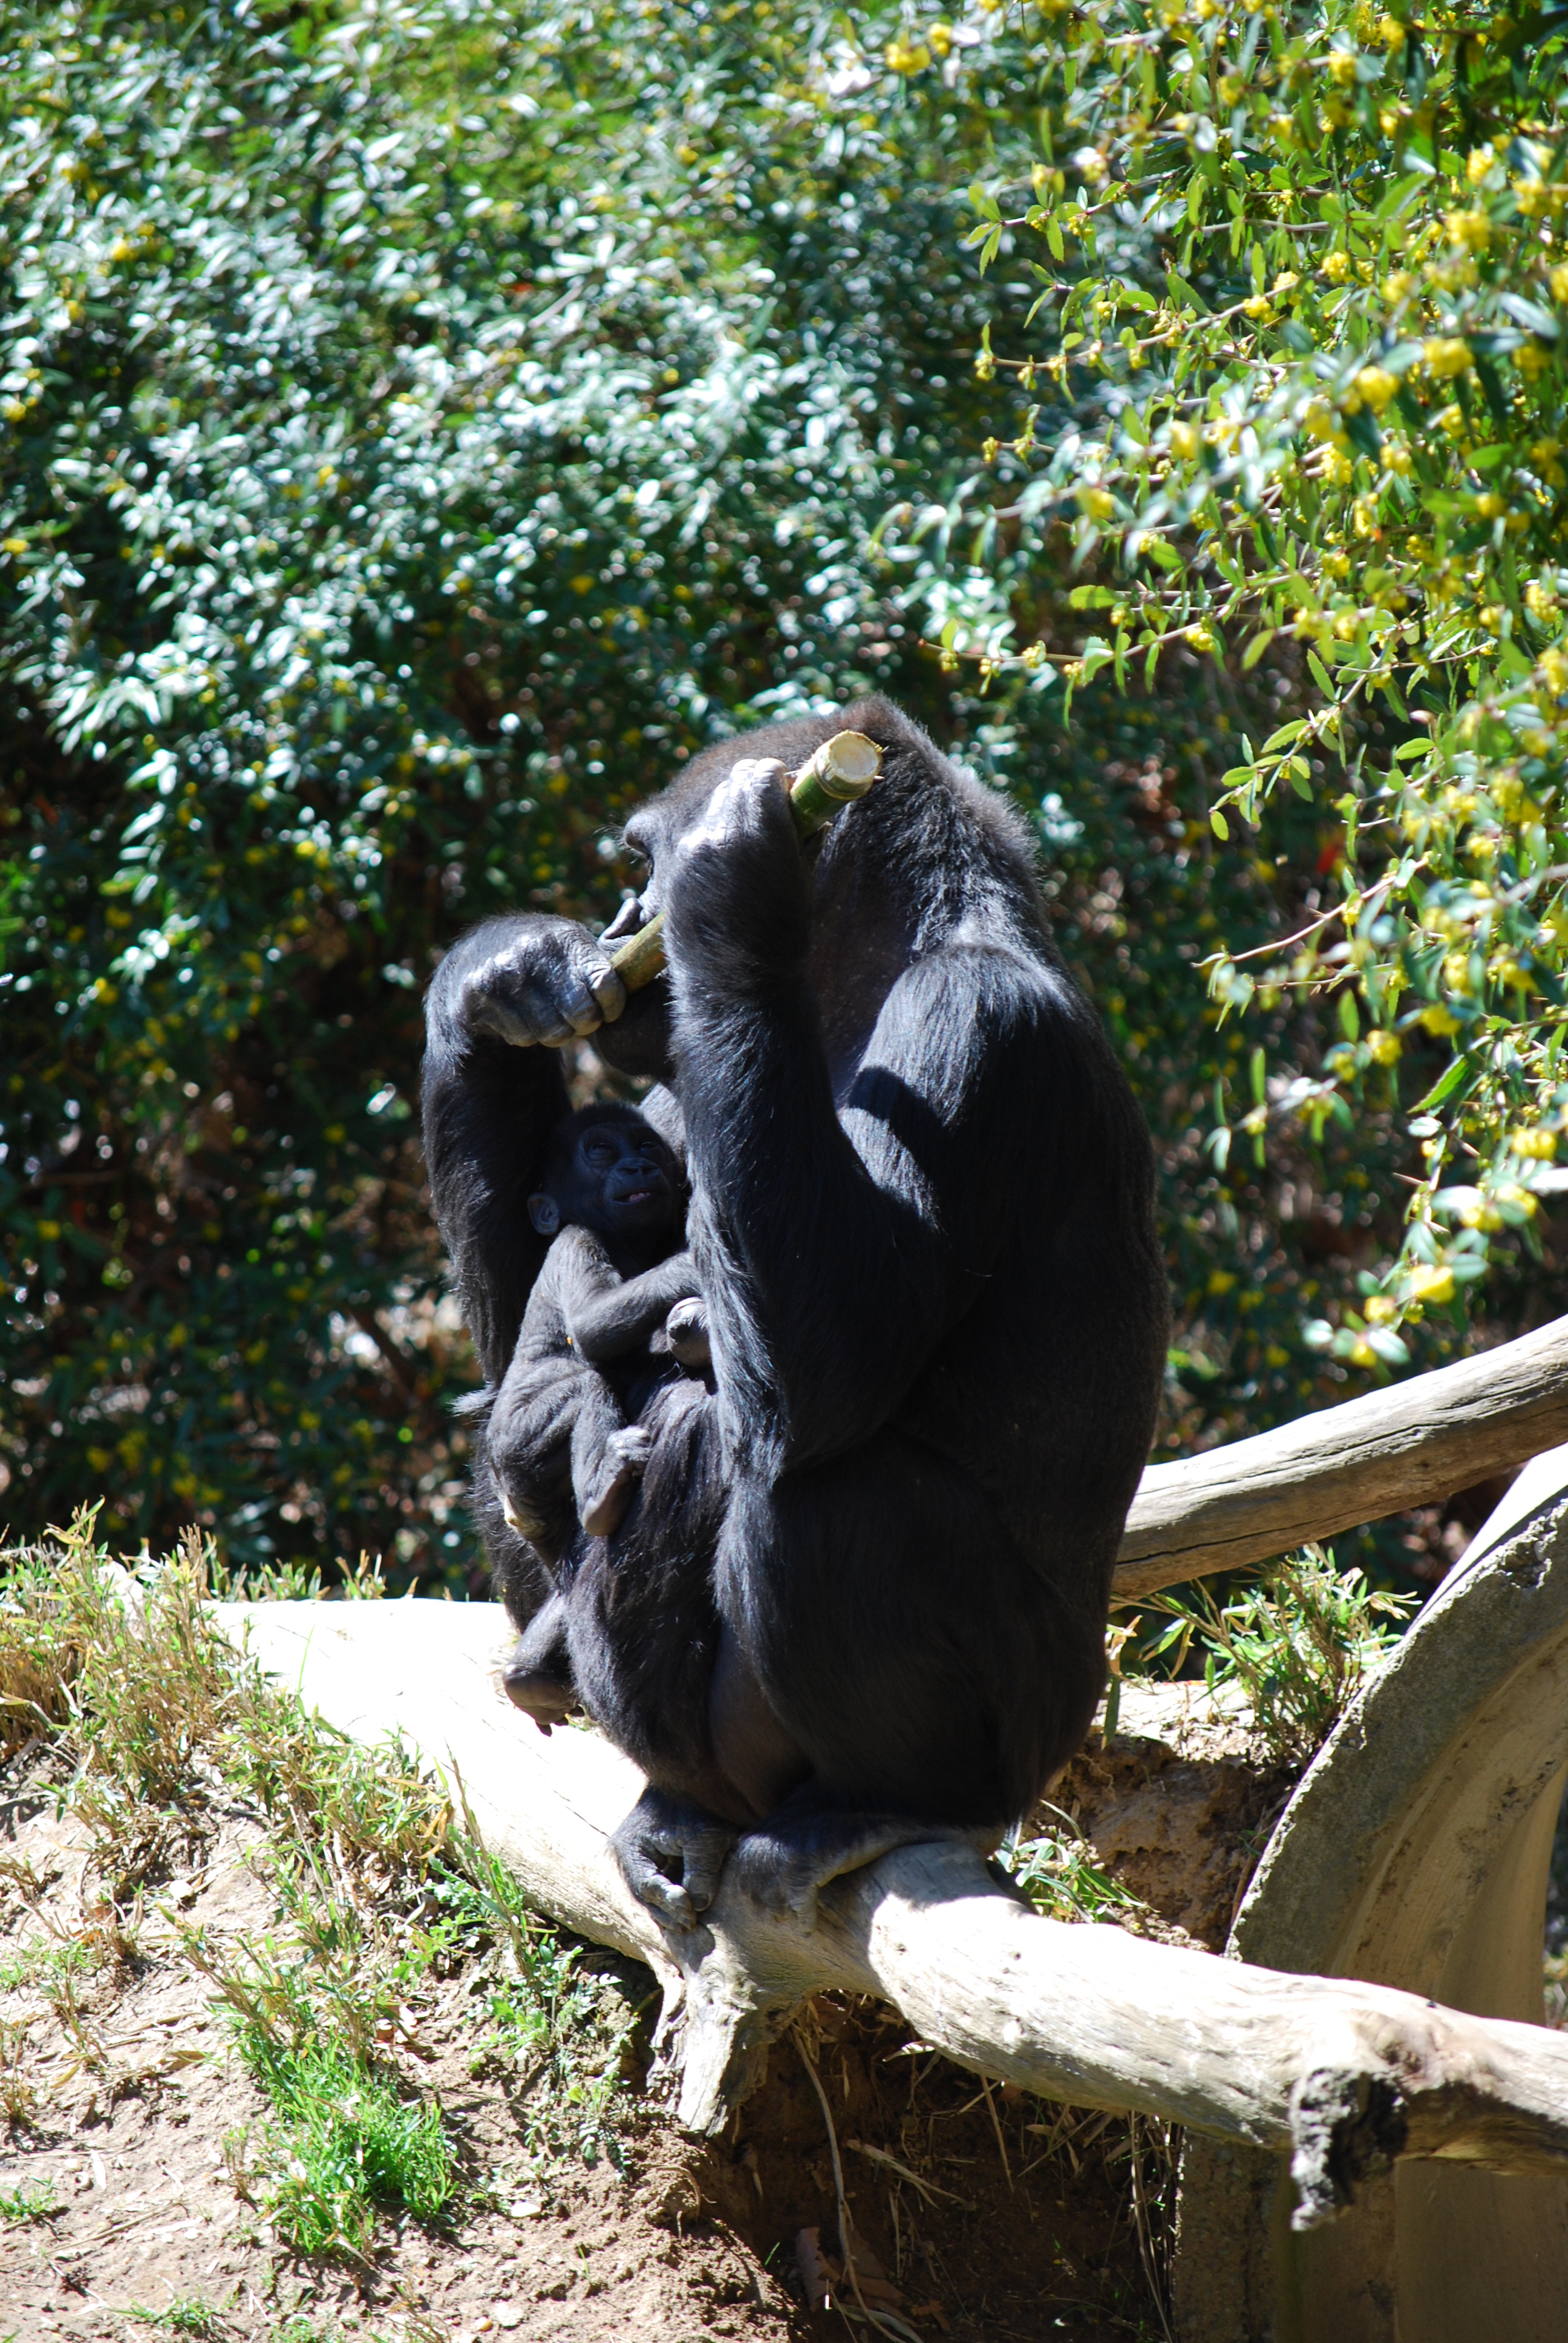 Baby & Mother Gorilla